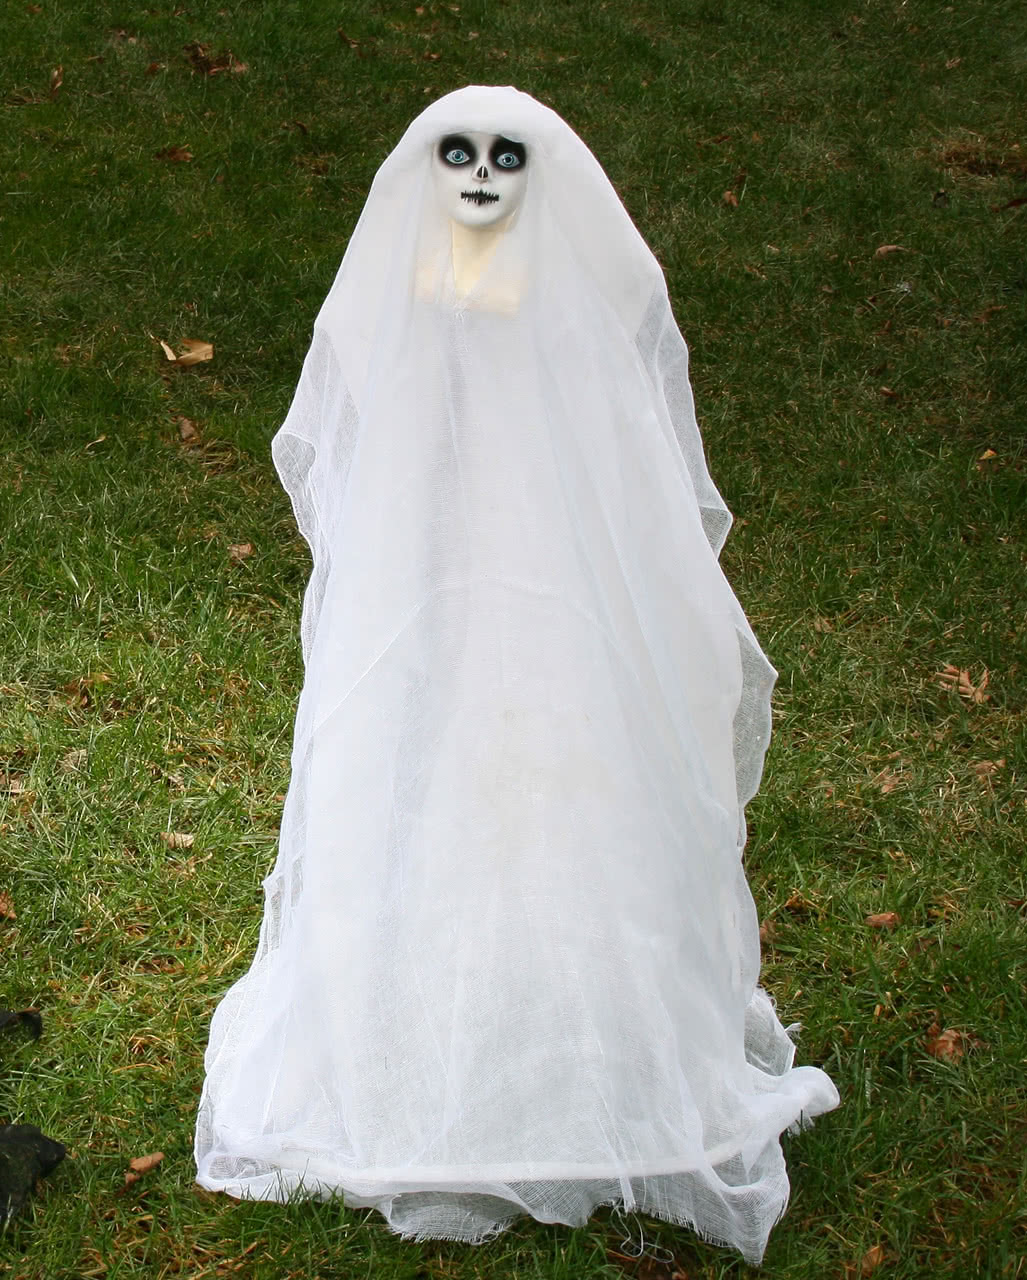 Halloween Kostüm Geisterbraut Einzigartig Geisterbraut Gartengeist Als Halloween Deko